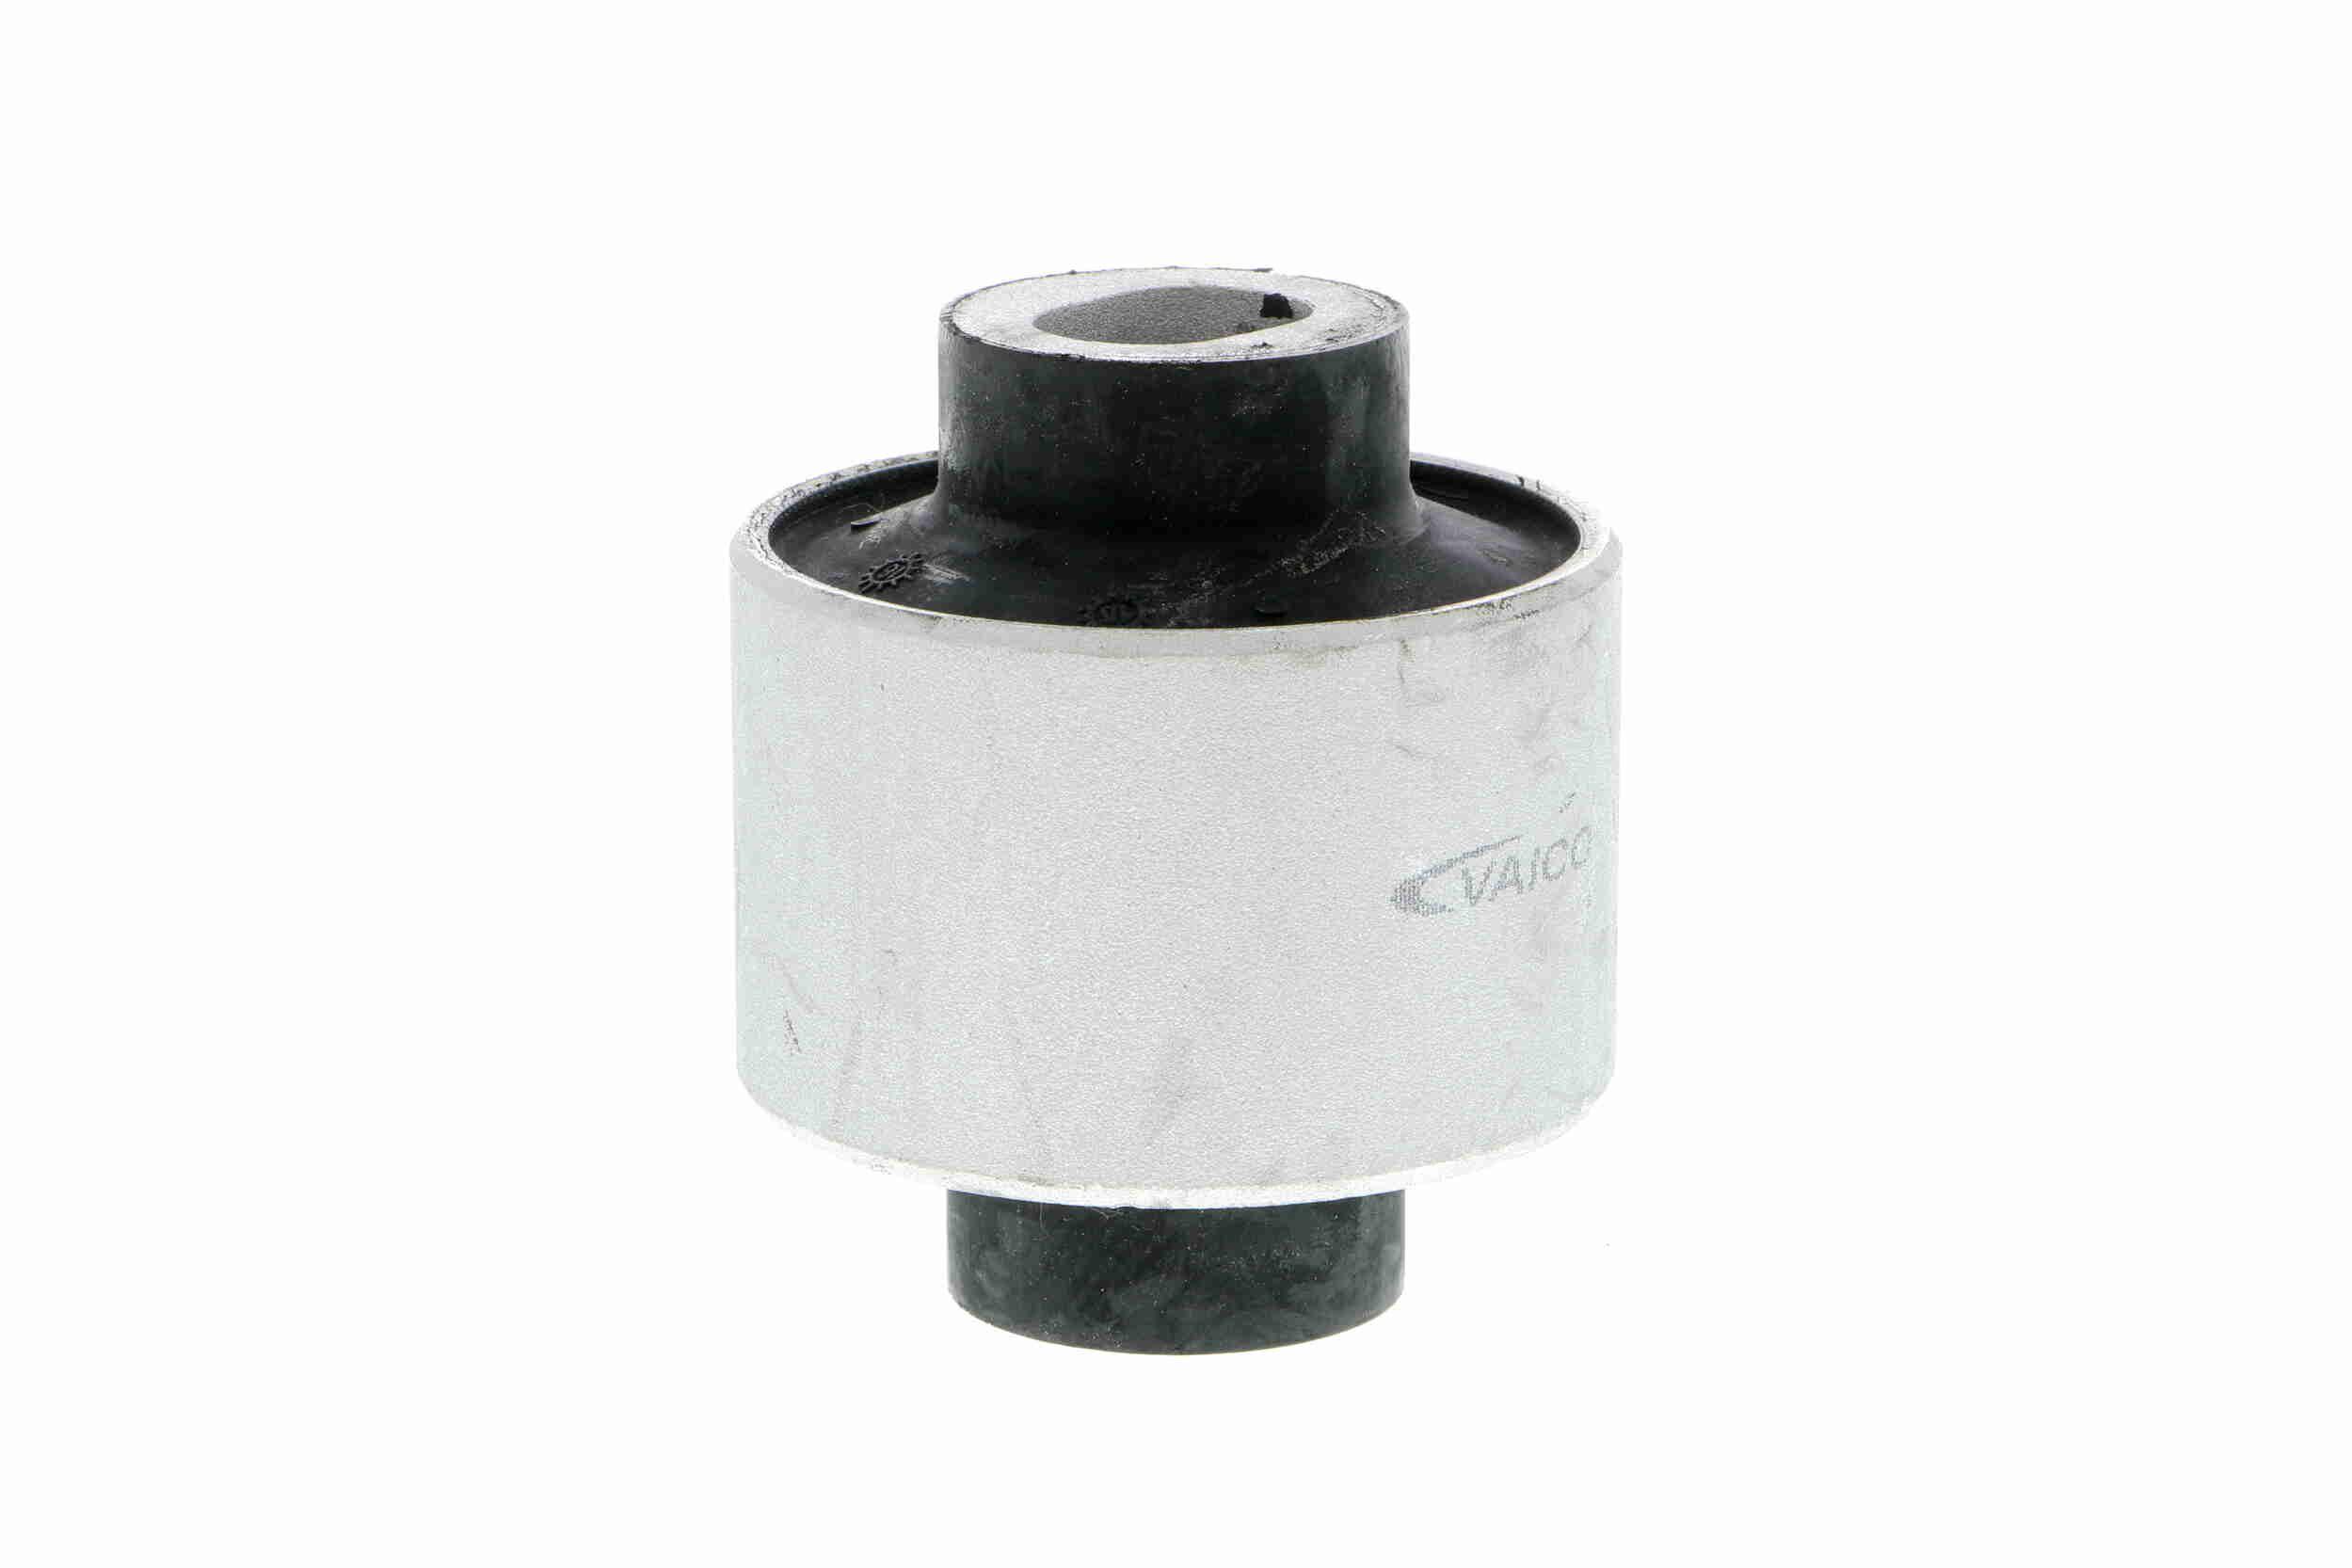 V30-7339 VAICO Original VAICO Qualität, Vorderachse, Querlenker Lagerung, Lenker V30-7339 günstig kaufen